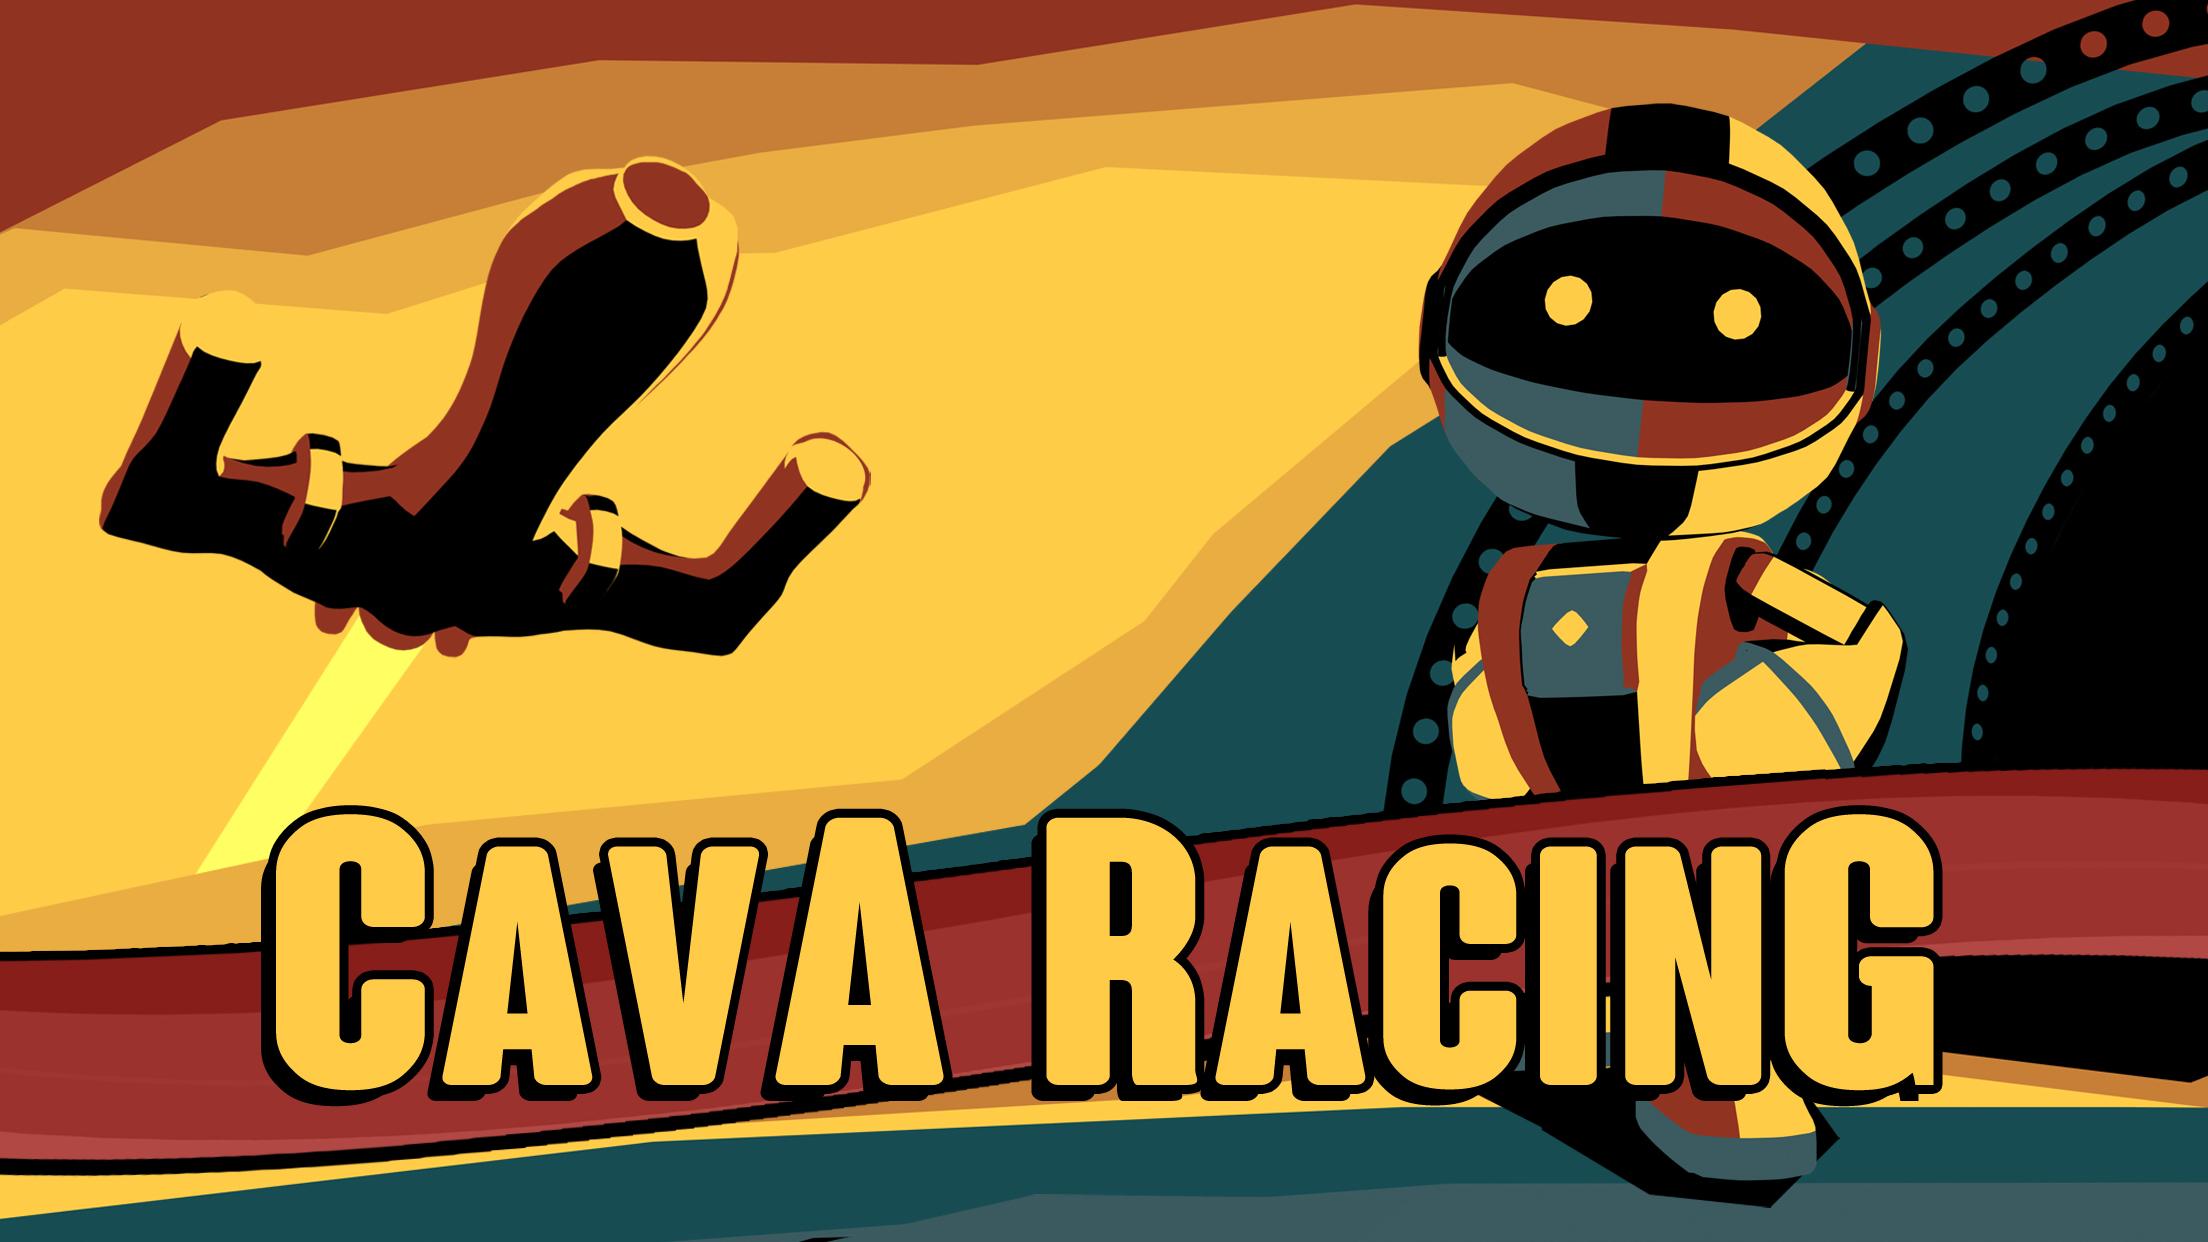 Cava_Racing_Poster